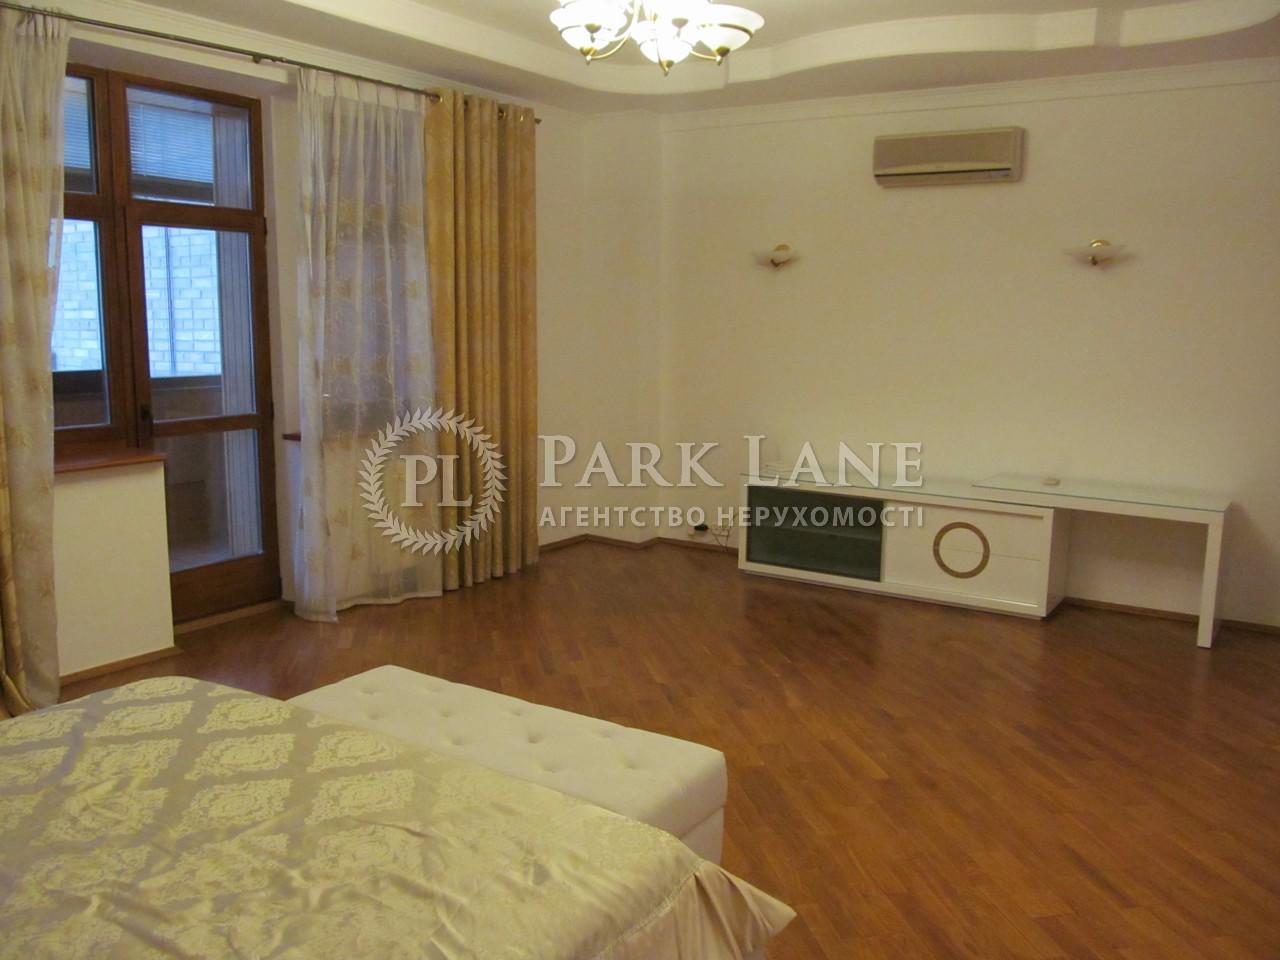 Квартира ул. Павловская, 18, Киев, C-72808 - Фото 15